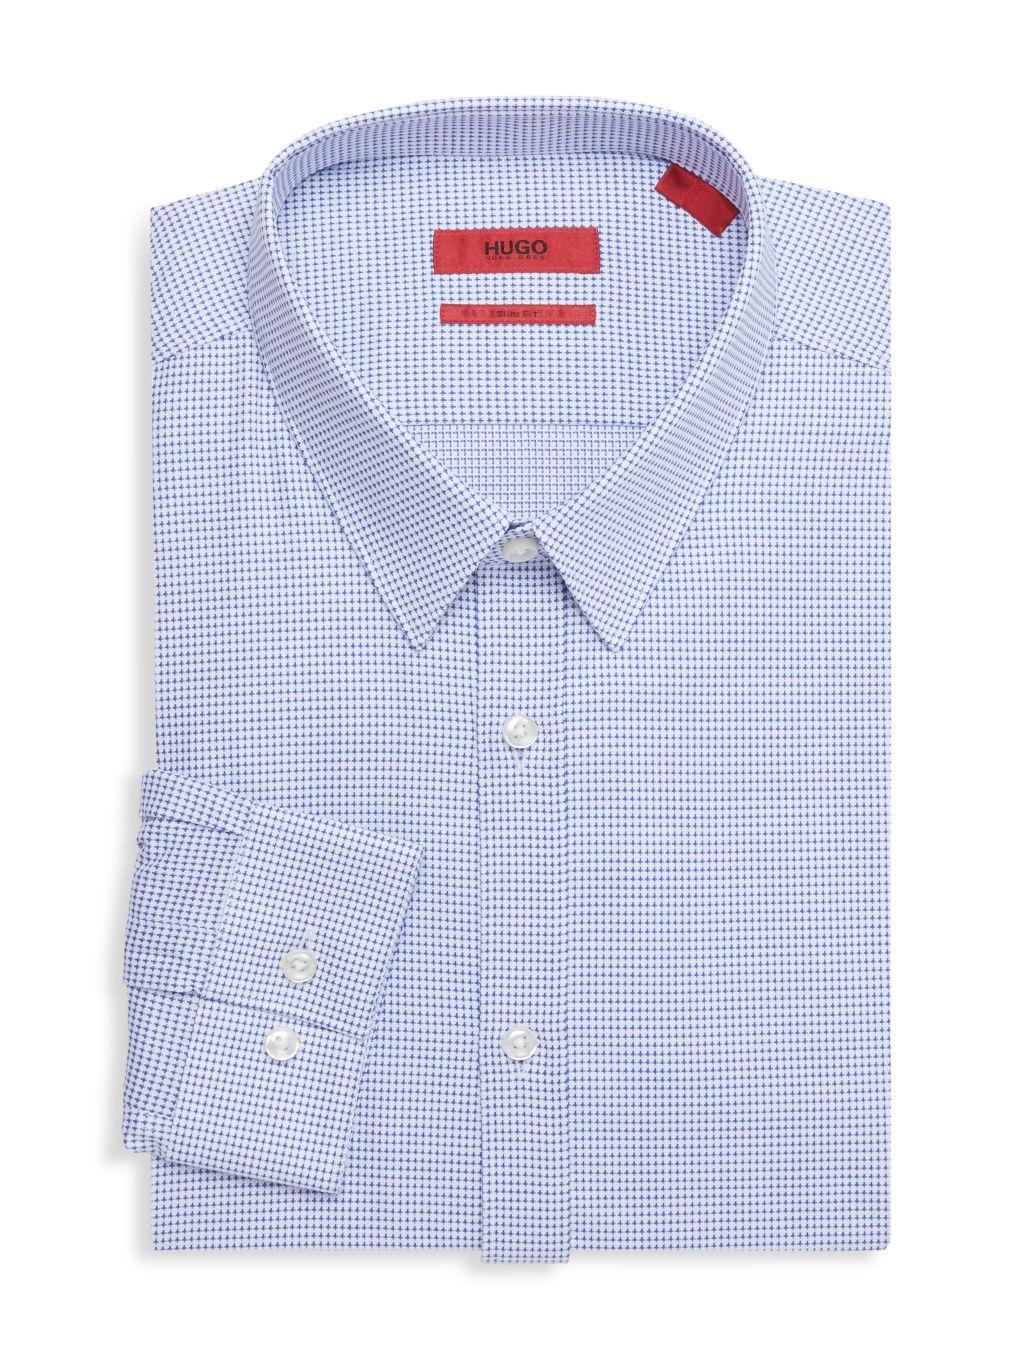 HUGO Slim-Fit Printed Dress Shirt